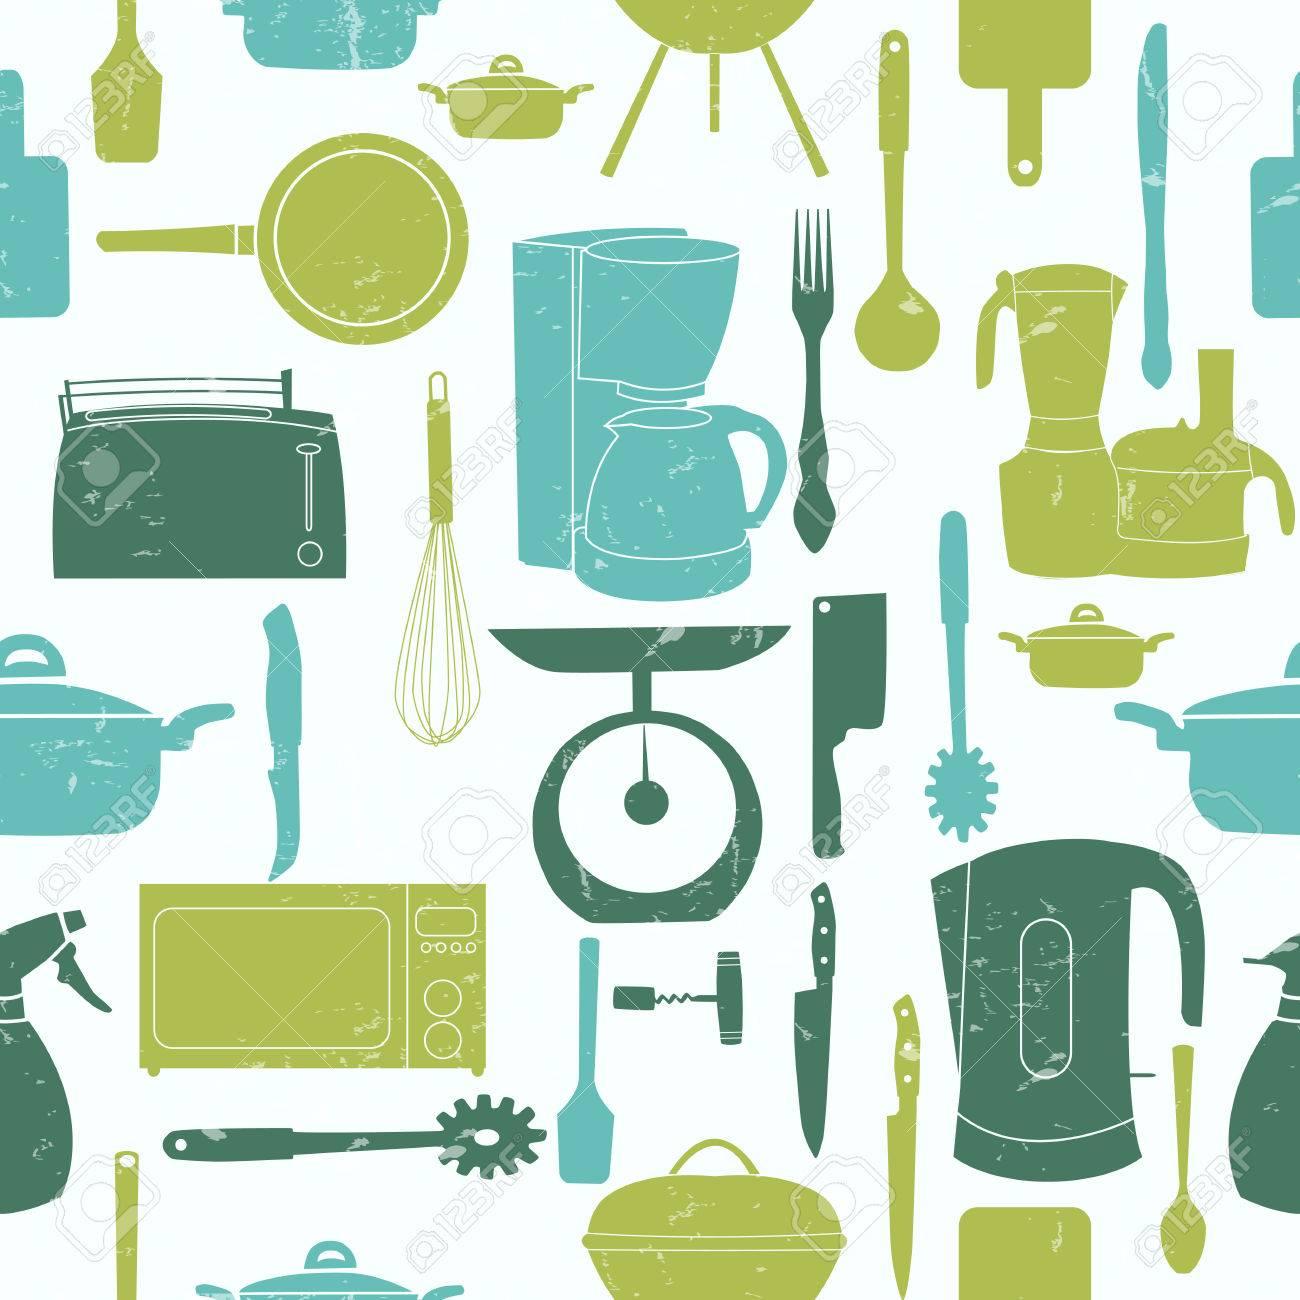 Grunge Retro Vector Illustration Seamless Pattern Of Kitchen ...